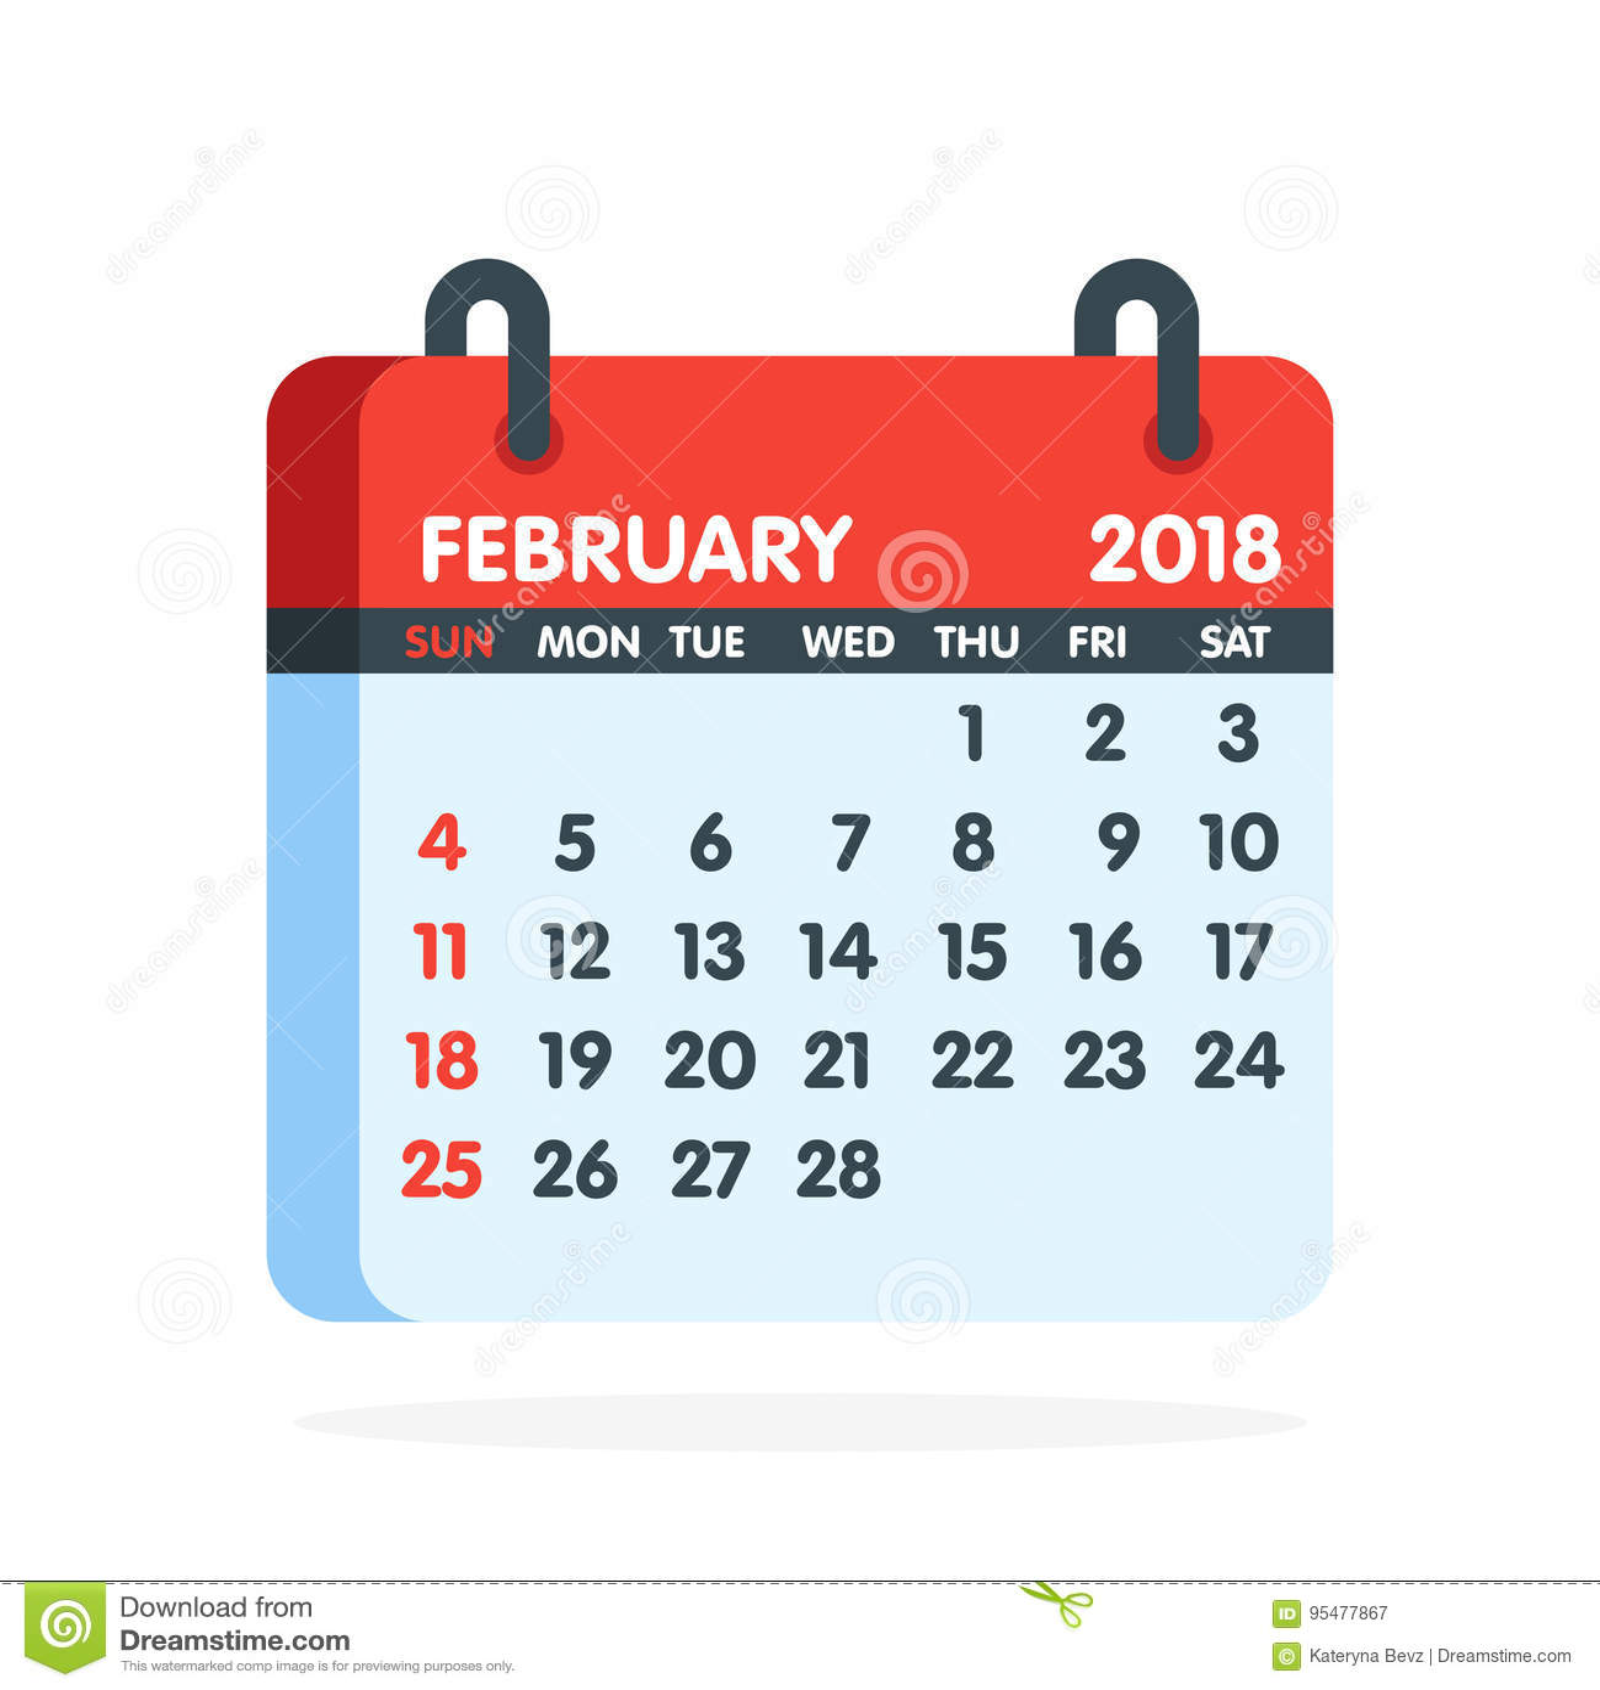 February Calendar Illustration : February calendar stock photo cartoondealer